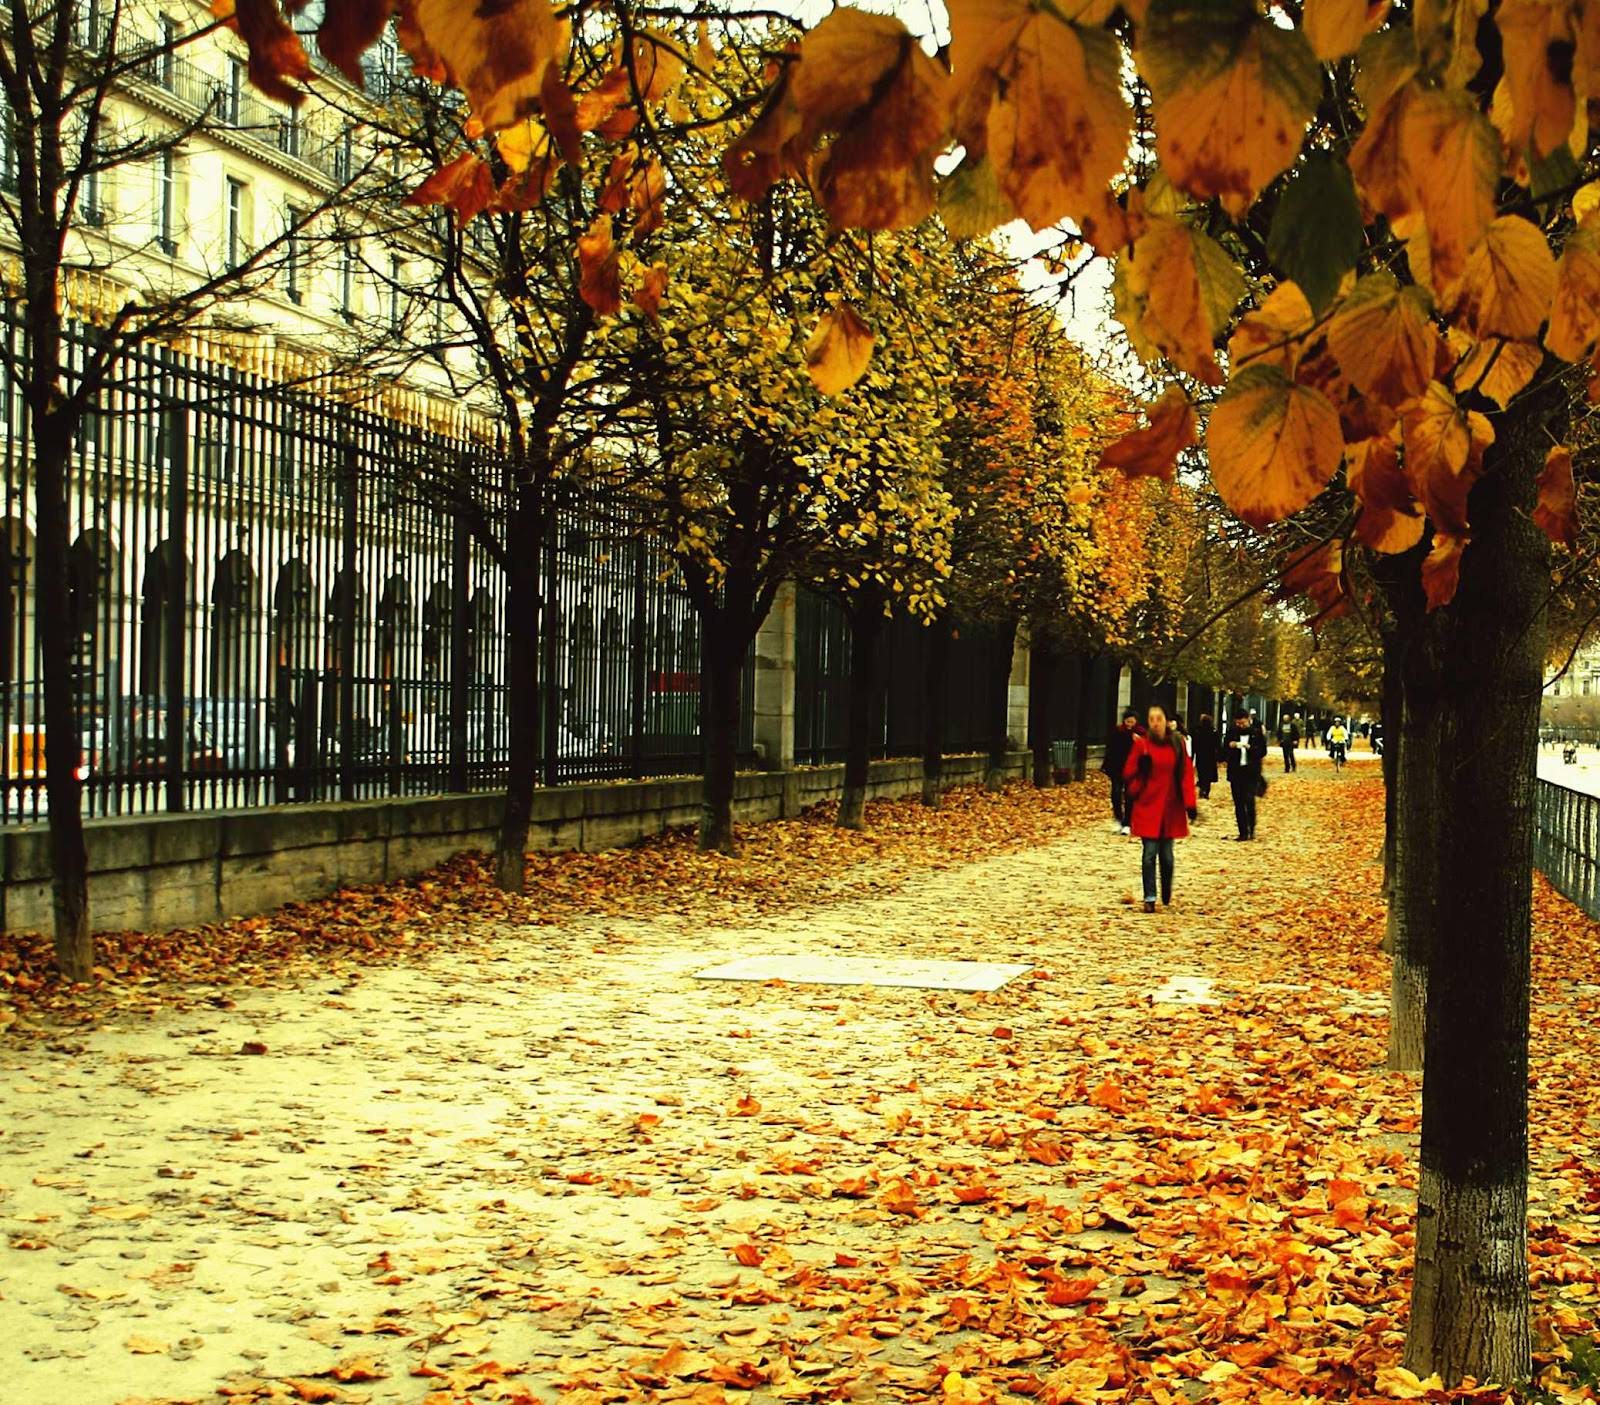 Autumn Street Wallpapers Top Free Autumn Street Backgrounds